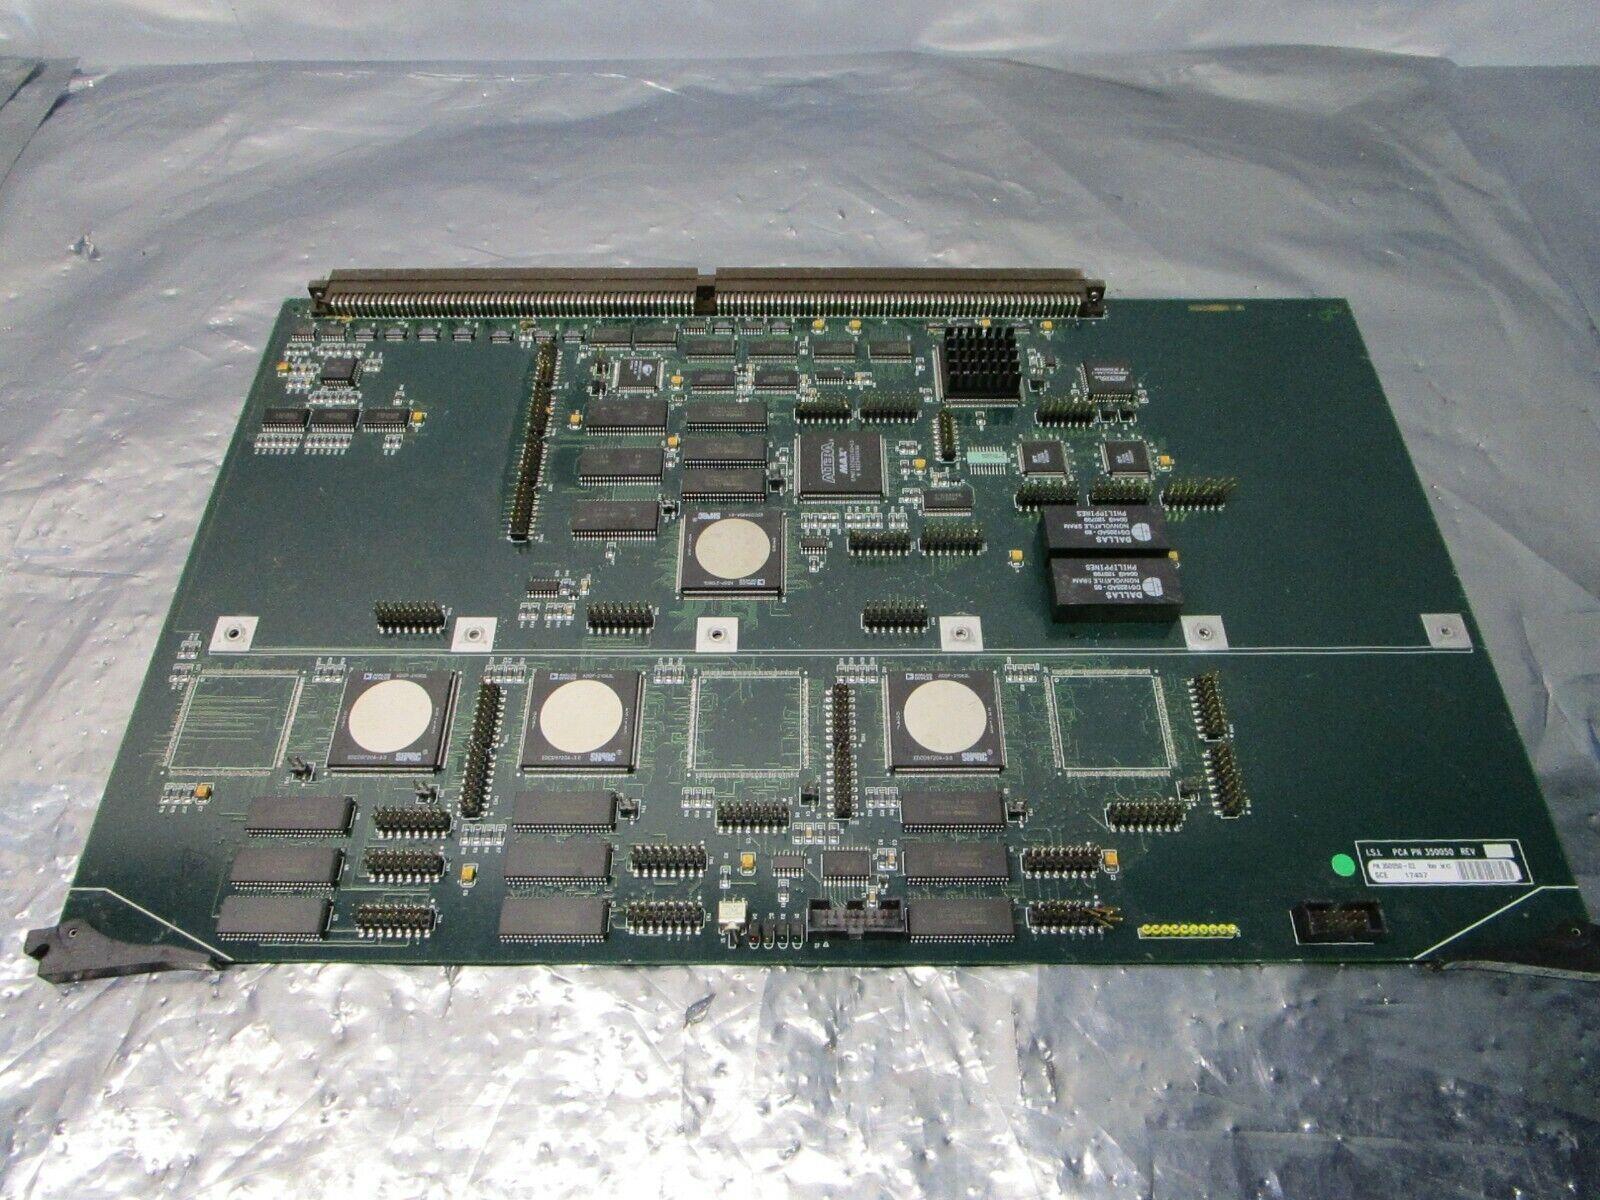 I.S.I. 350050-02 PCA Board, 350050, PCB 350055, 101223